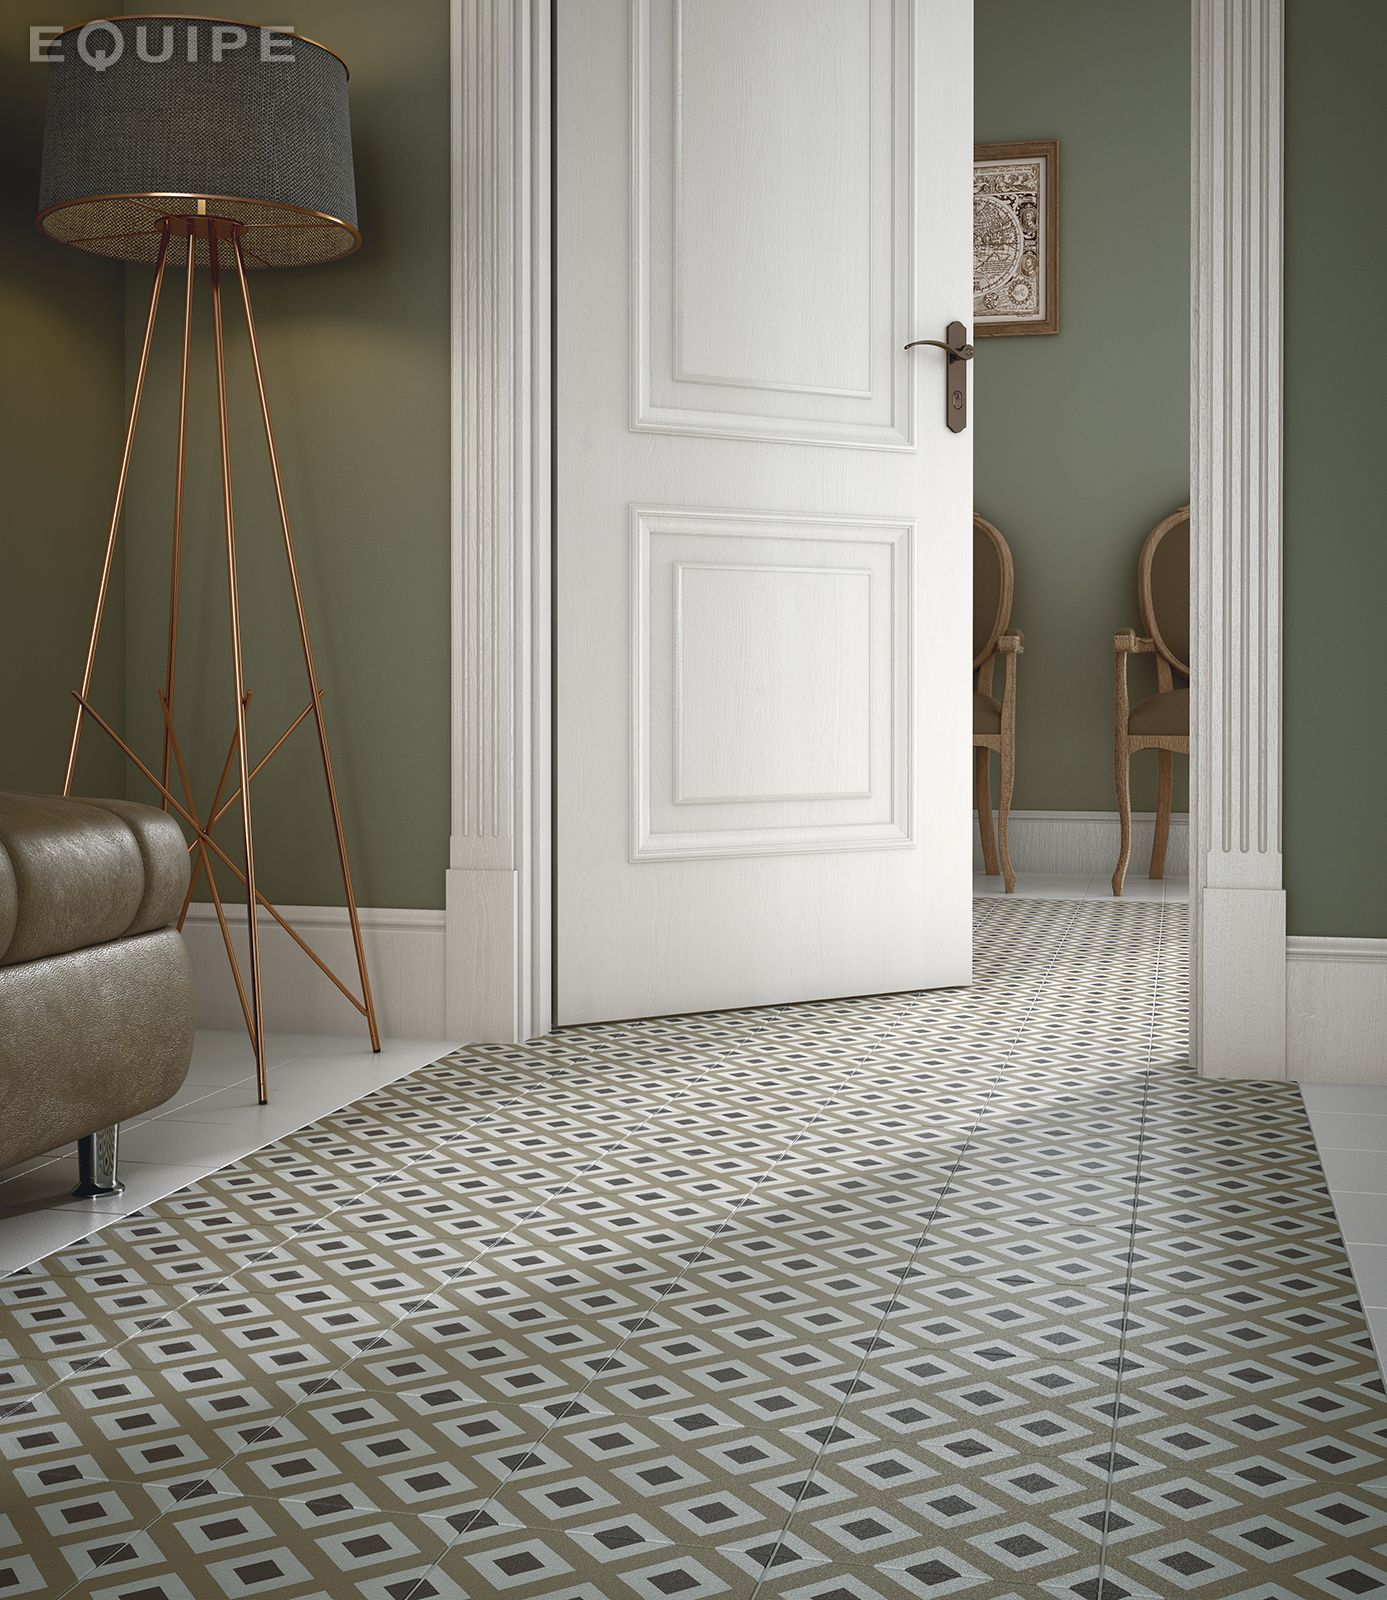 Amazing 1 Ceramic Tile Tiny 18X18 Ceramic Floor Tile Rectangular 2 By 4 Ceiling Tiles 2 X 12 Subway Tile Old 2 X4 Ceiling Tiles Brown24 Inch Ceramic Tile Caprice White, DECO City Colours 20x20 | Home Ideas | Pinterest ..